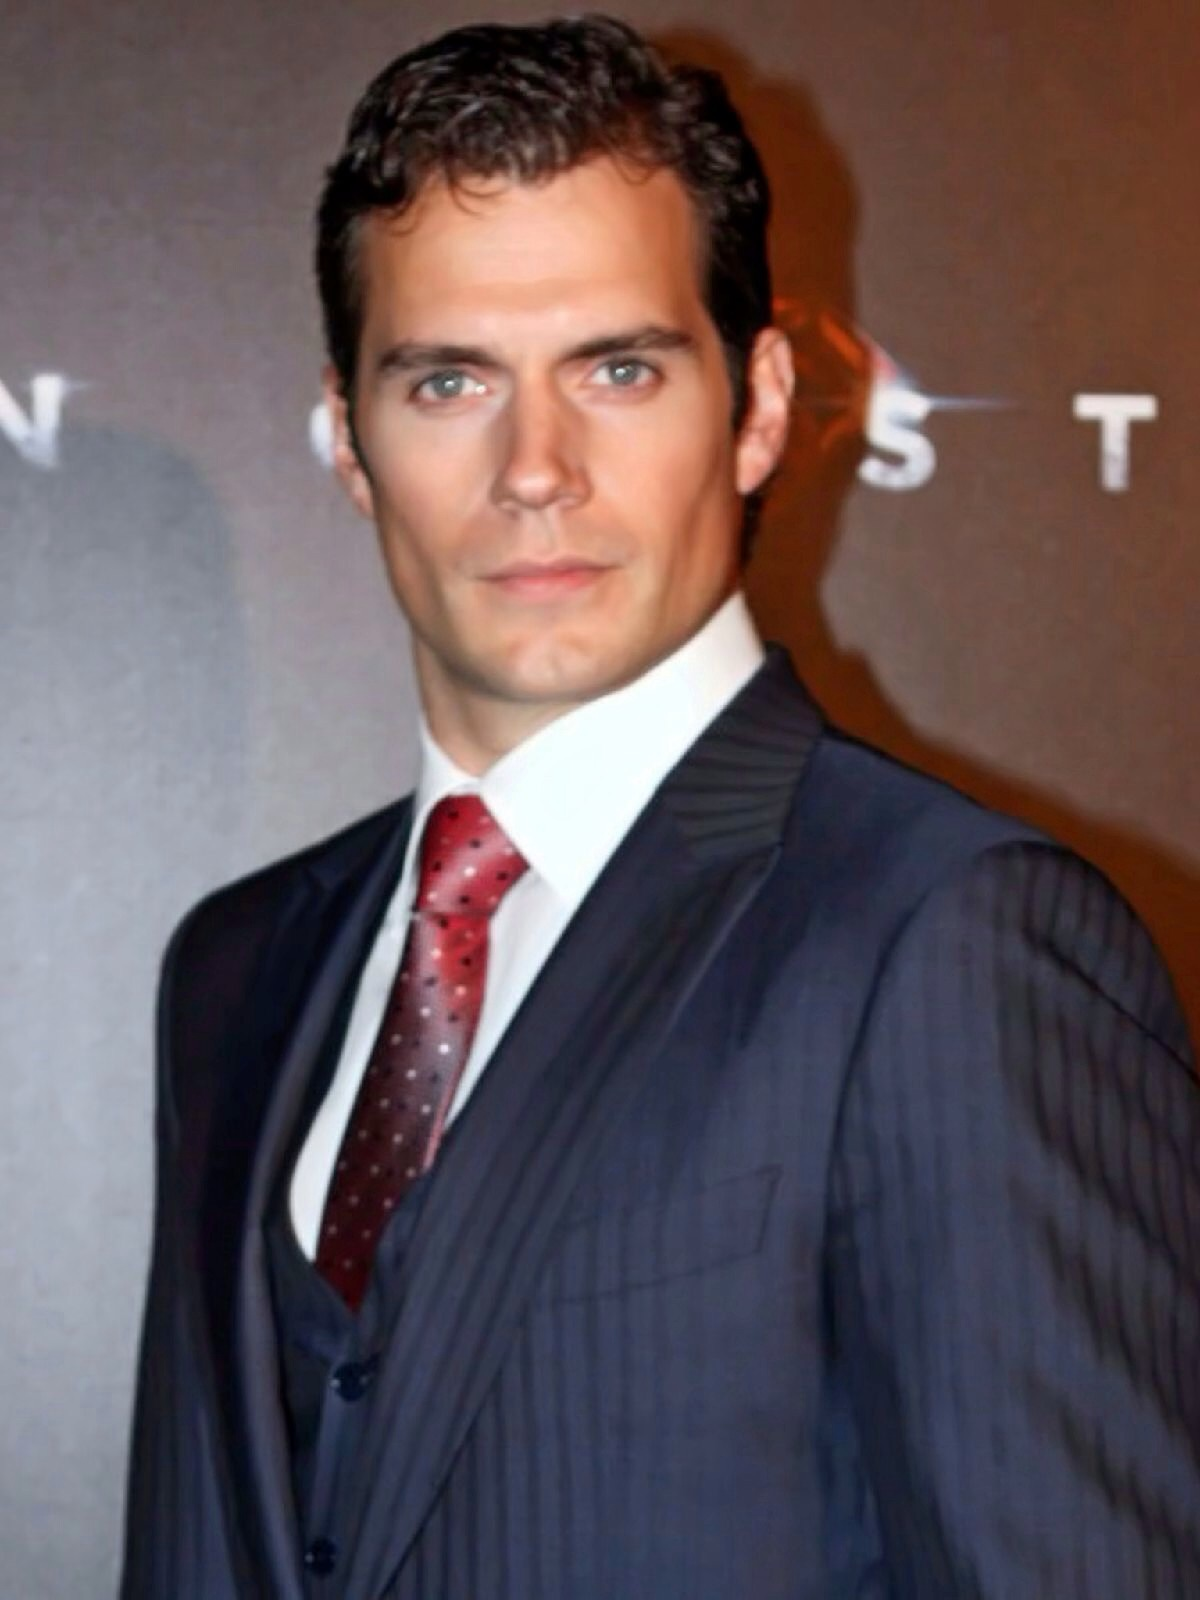 next james bond actor henry cavill dating